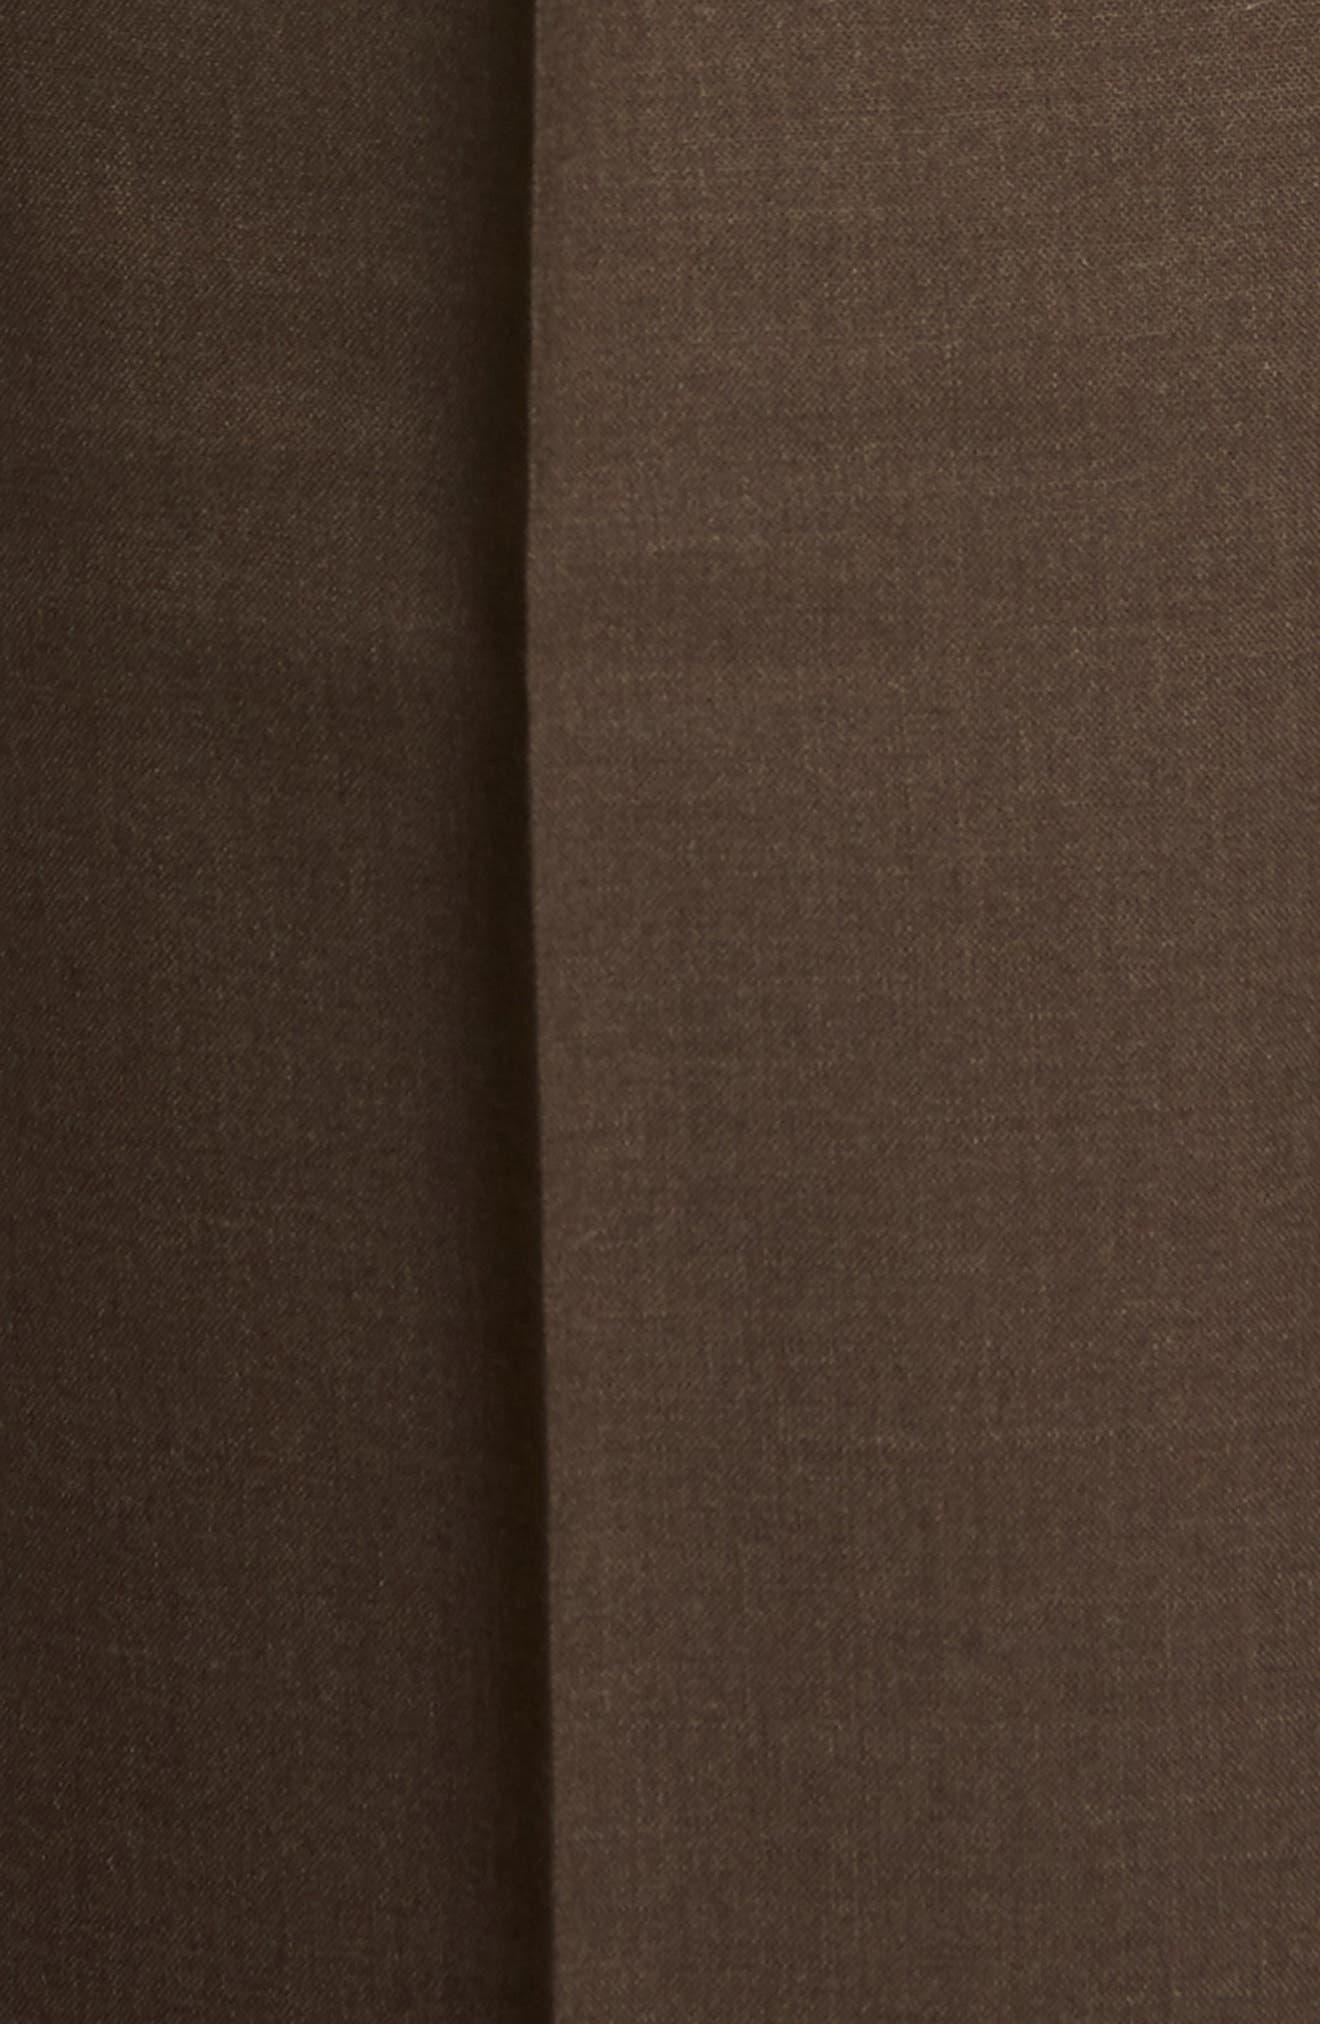 Self Sizer Waist Pleated Wool Gabardine Trousers,                             Alternate thumbnail 5, color,                             BROWN